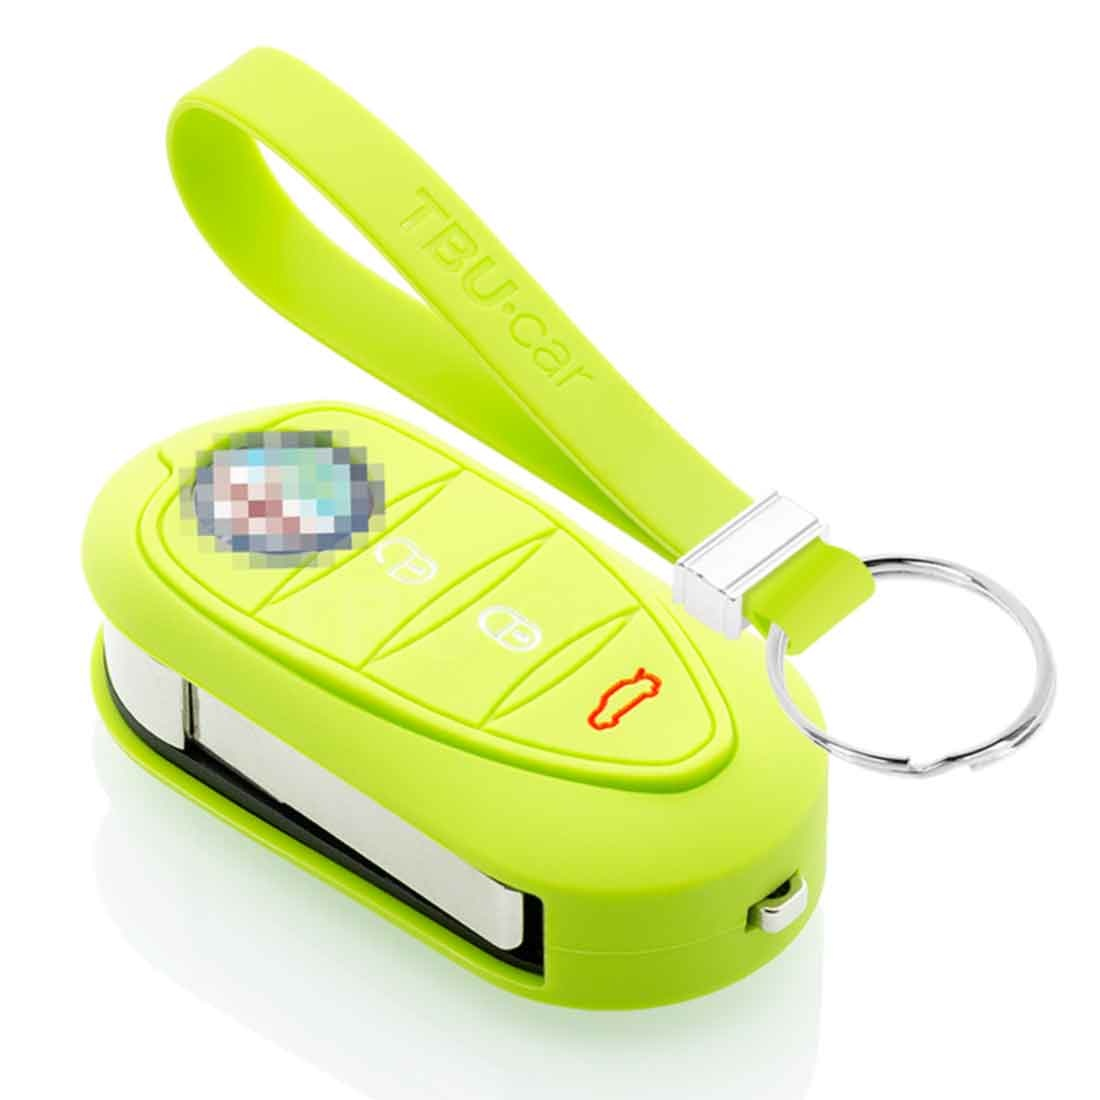 TBU car TBU car Sleutel cover compatibel met Alfa Romeo - Silicone sleutelhoesje - beschermhoesje autosleutel - Lime groen